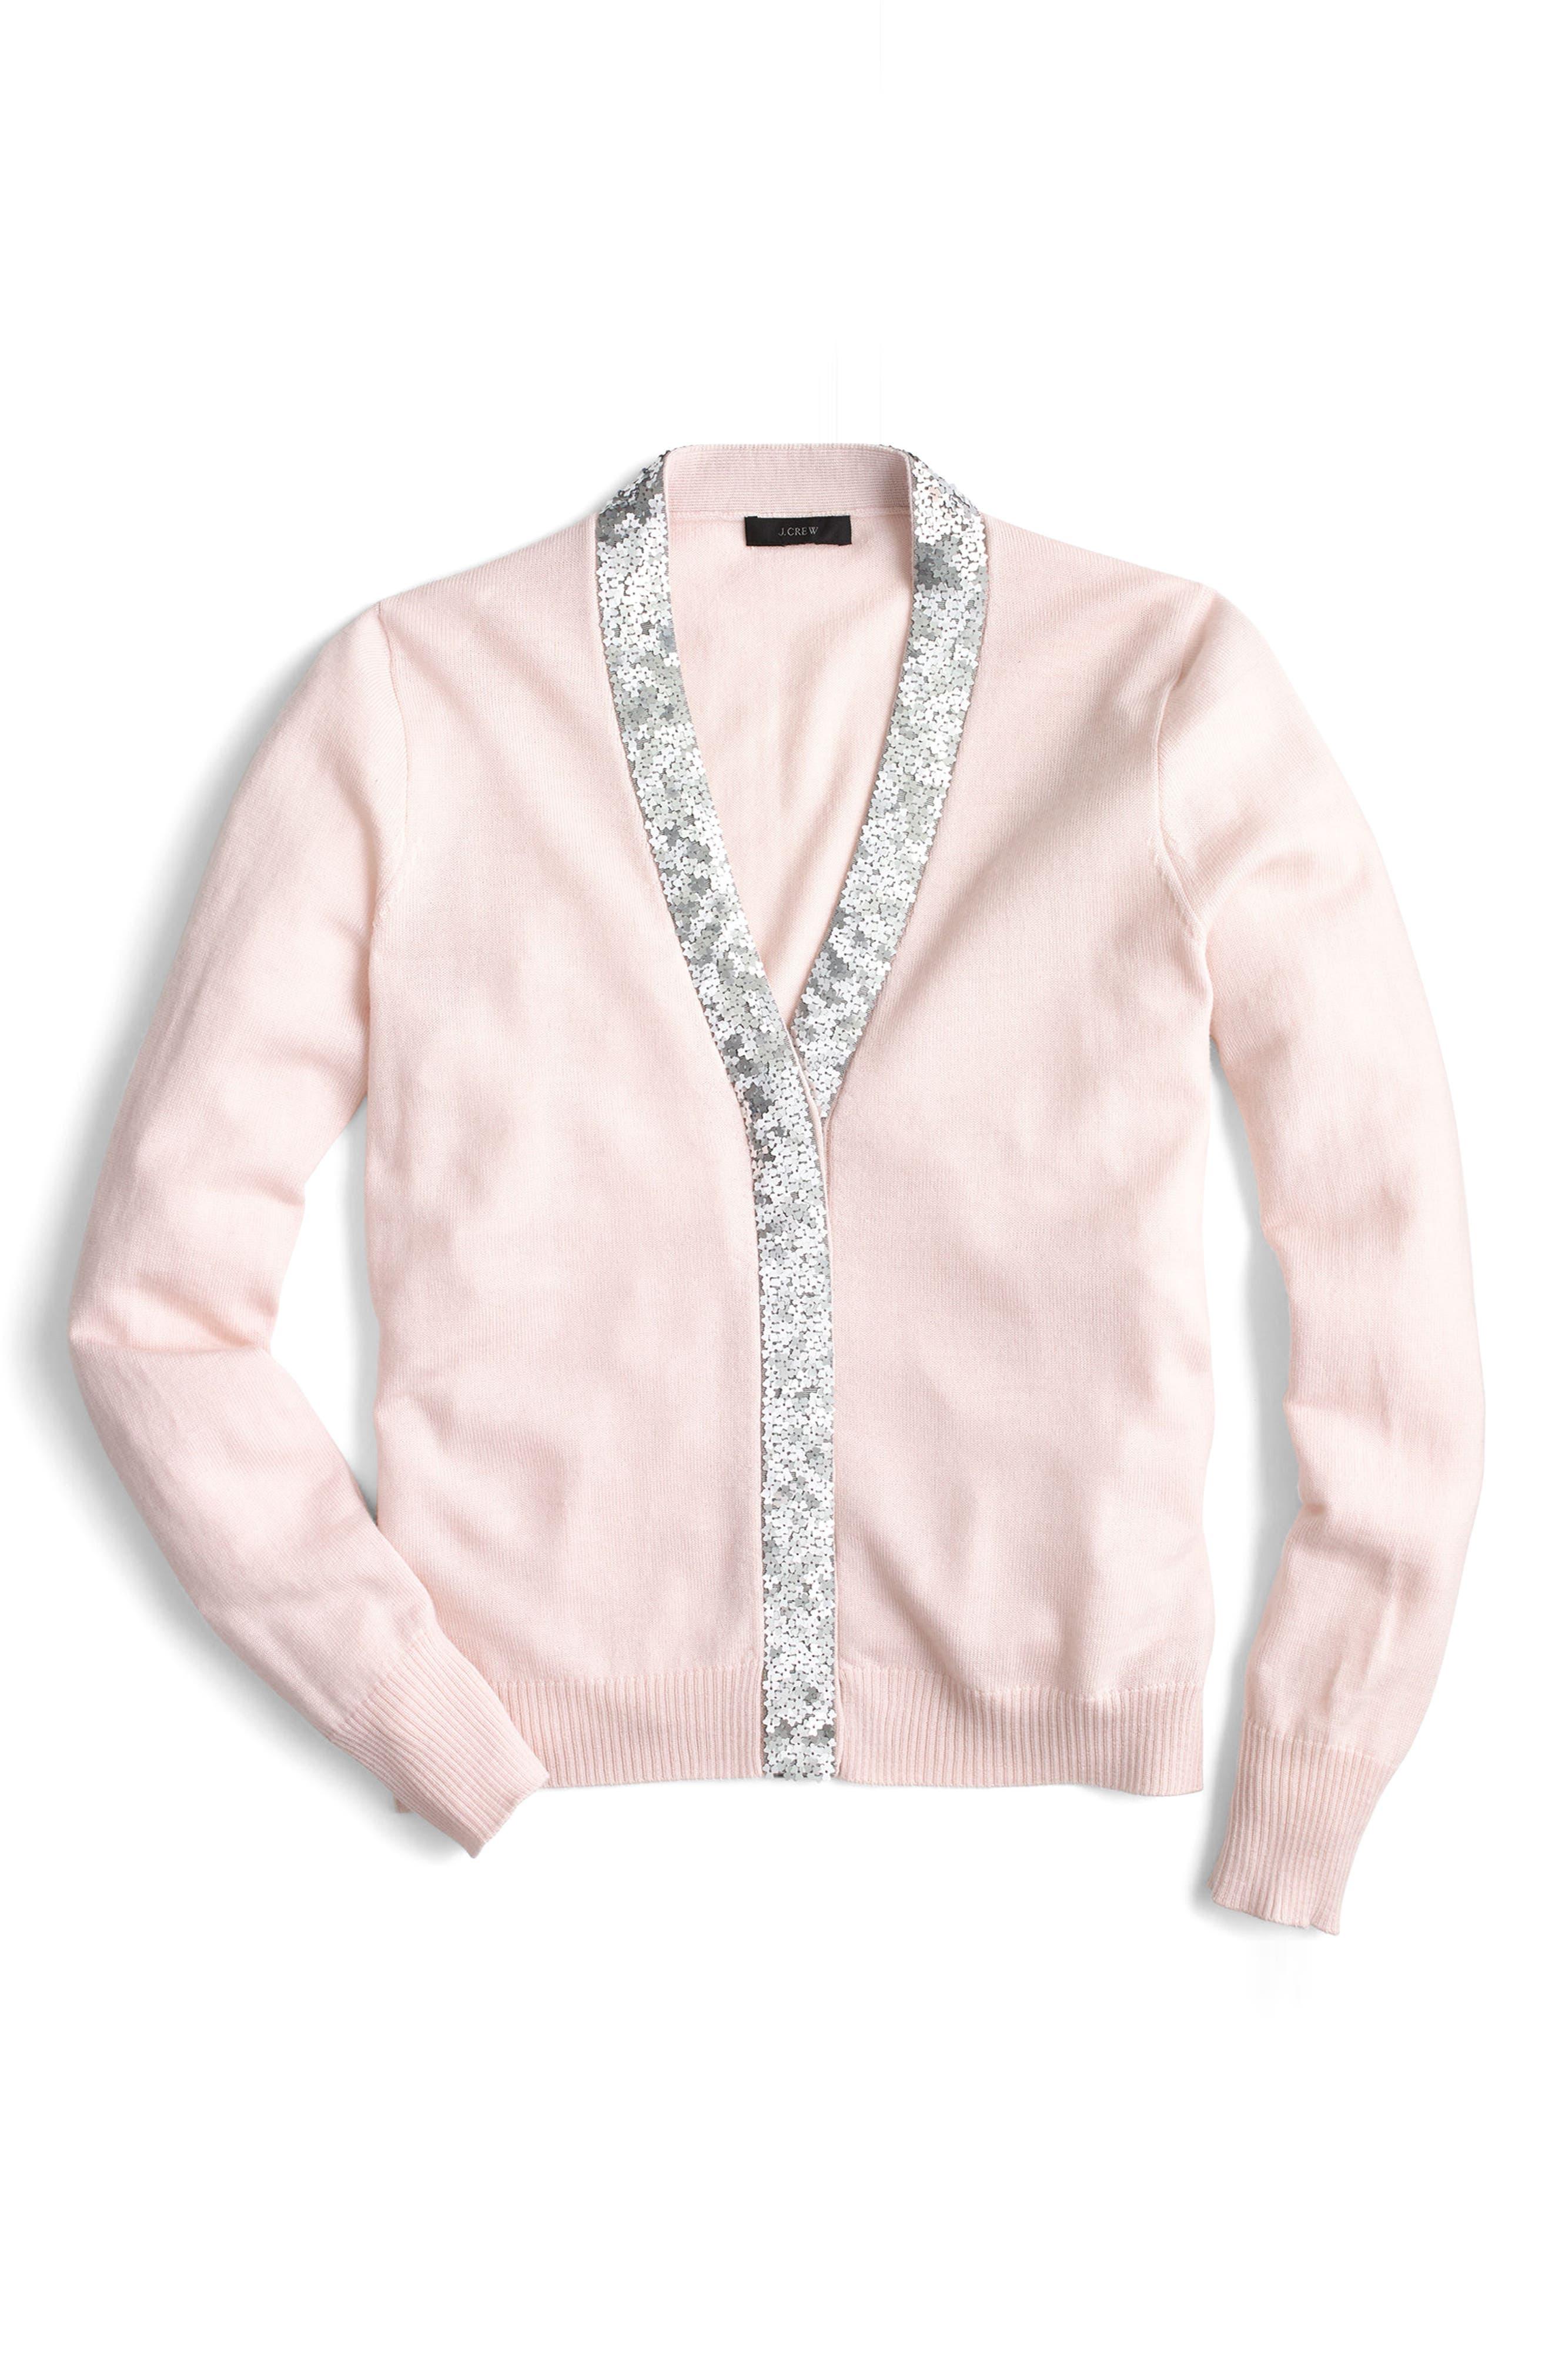 Harlow Sequin Placket Cardigan,                         Main,                         color, Blush